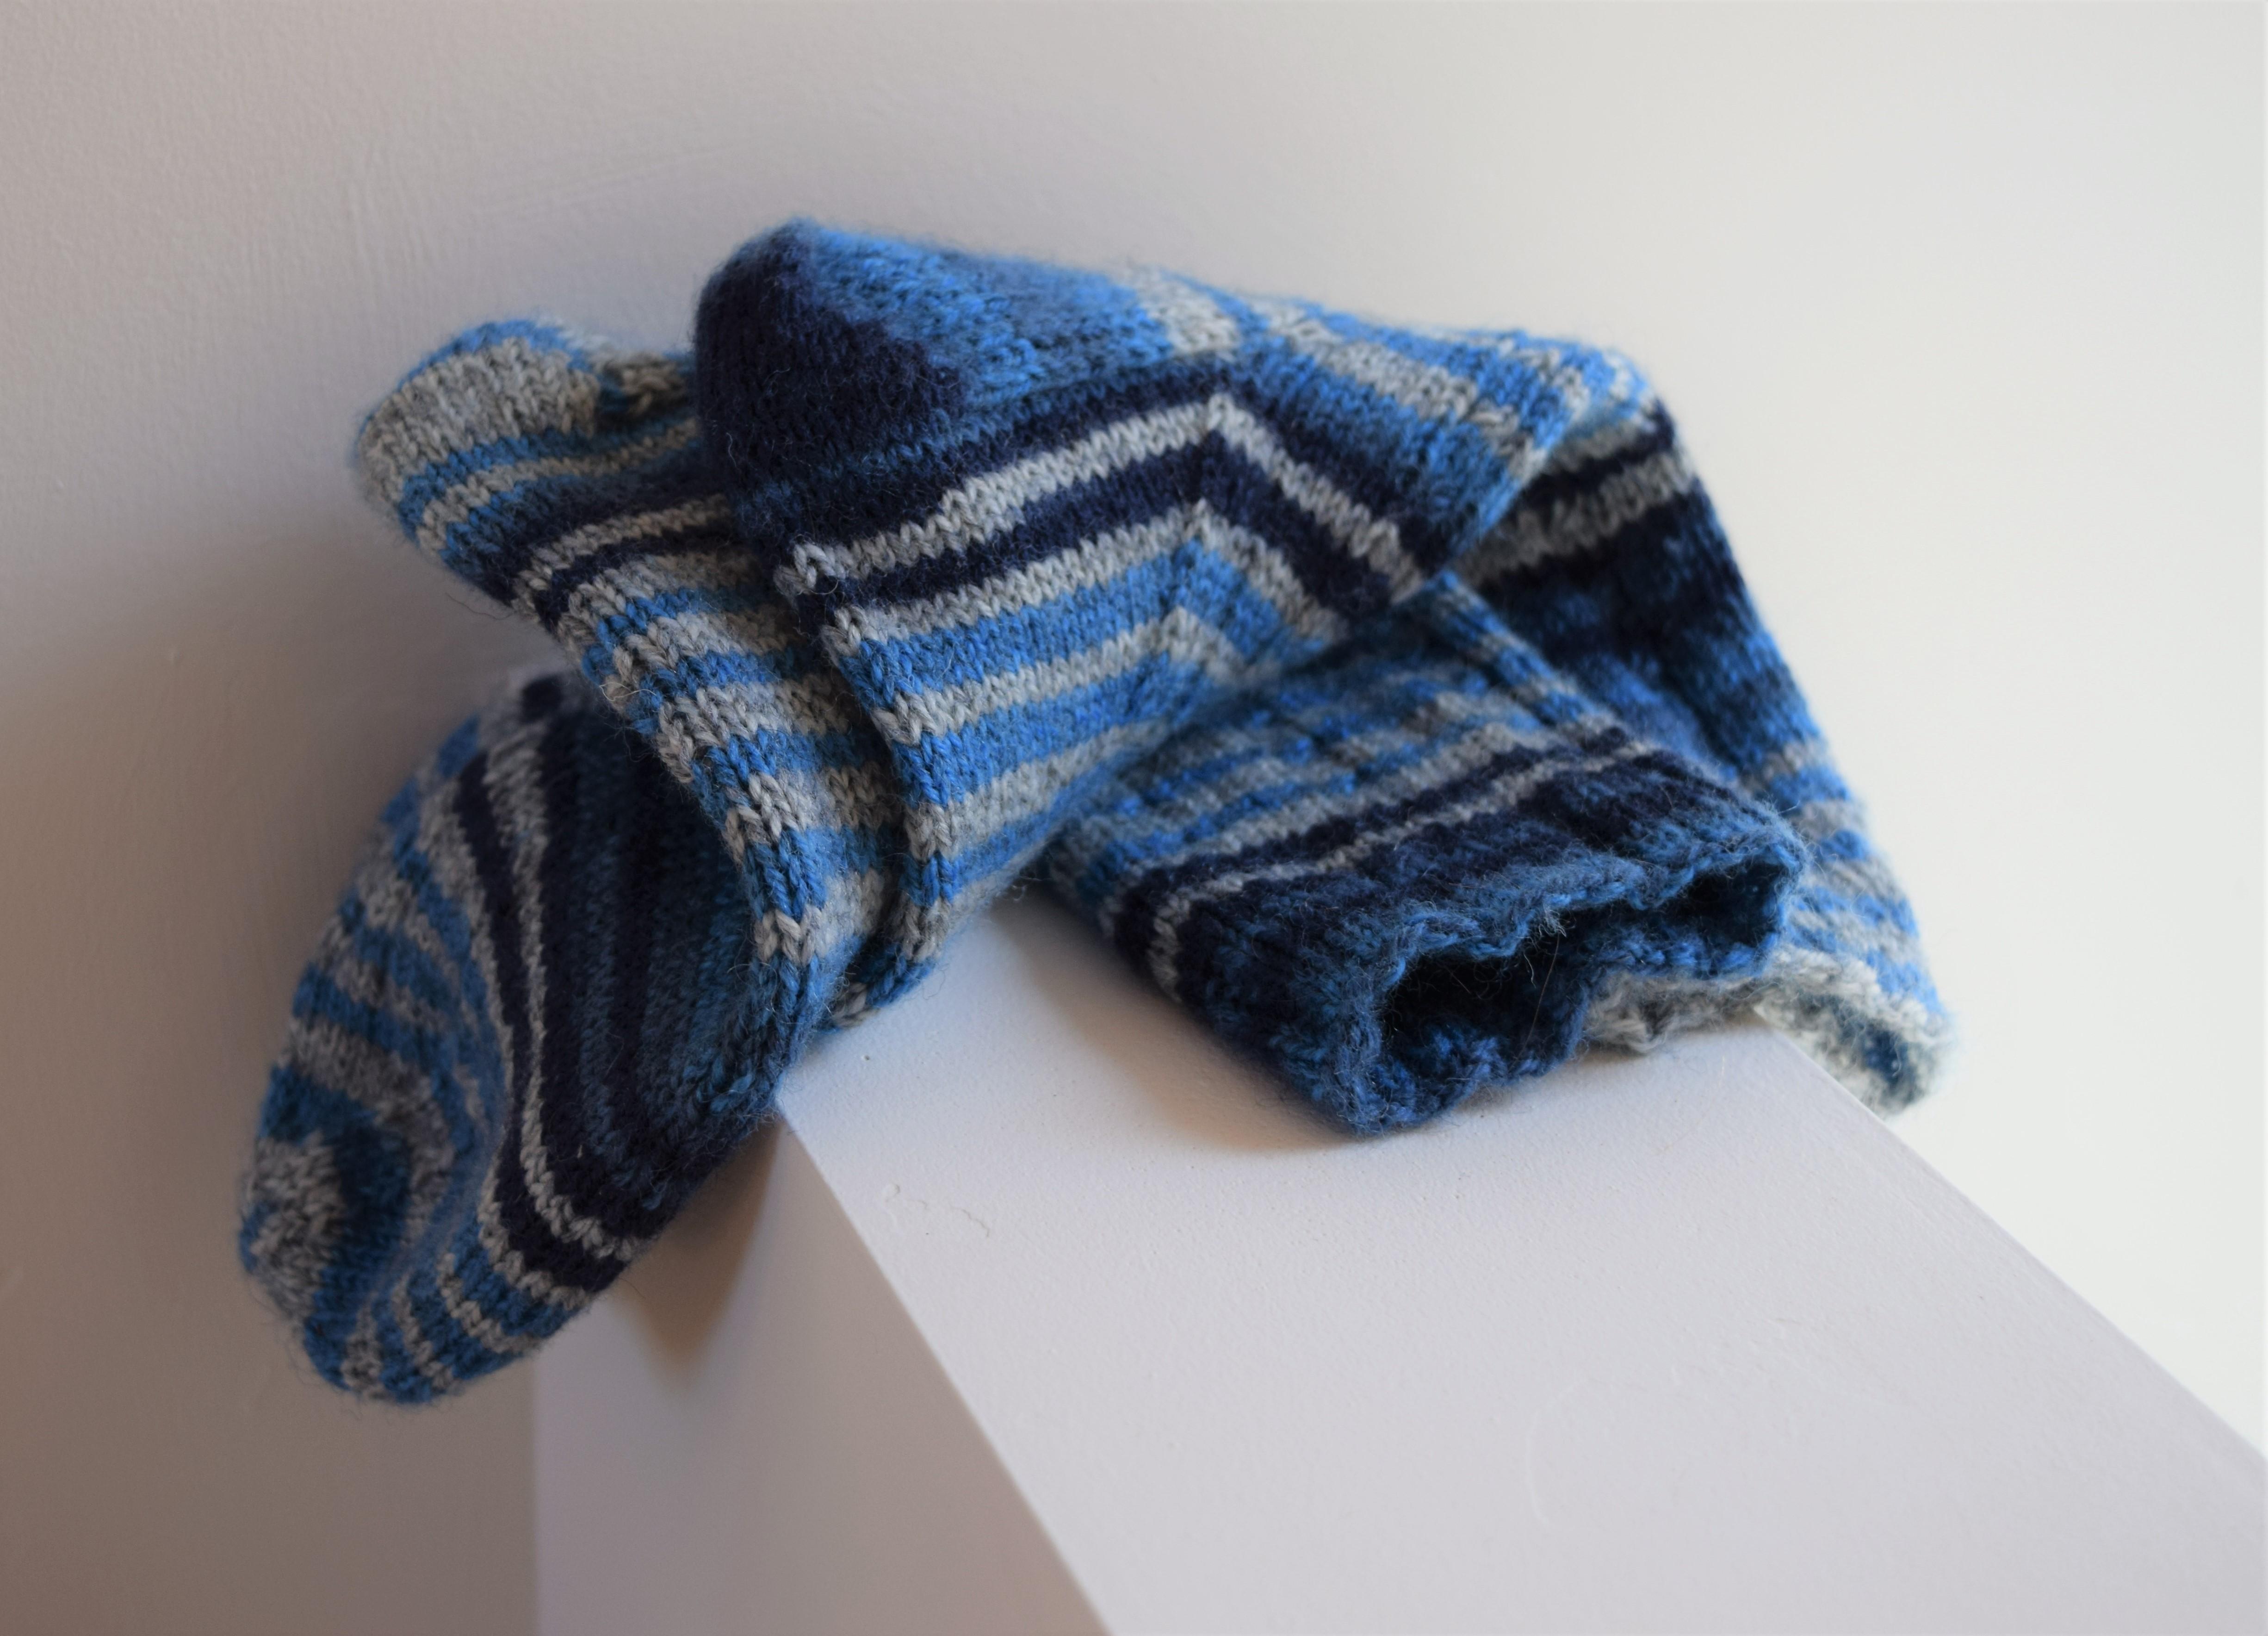 jenjoycedesign© Walking With Emma socks 1